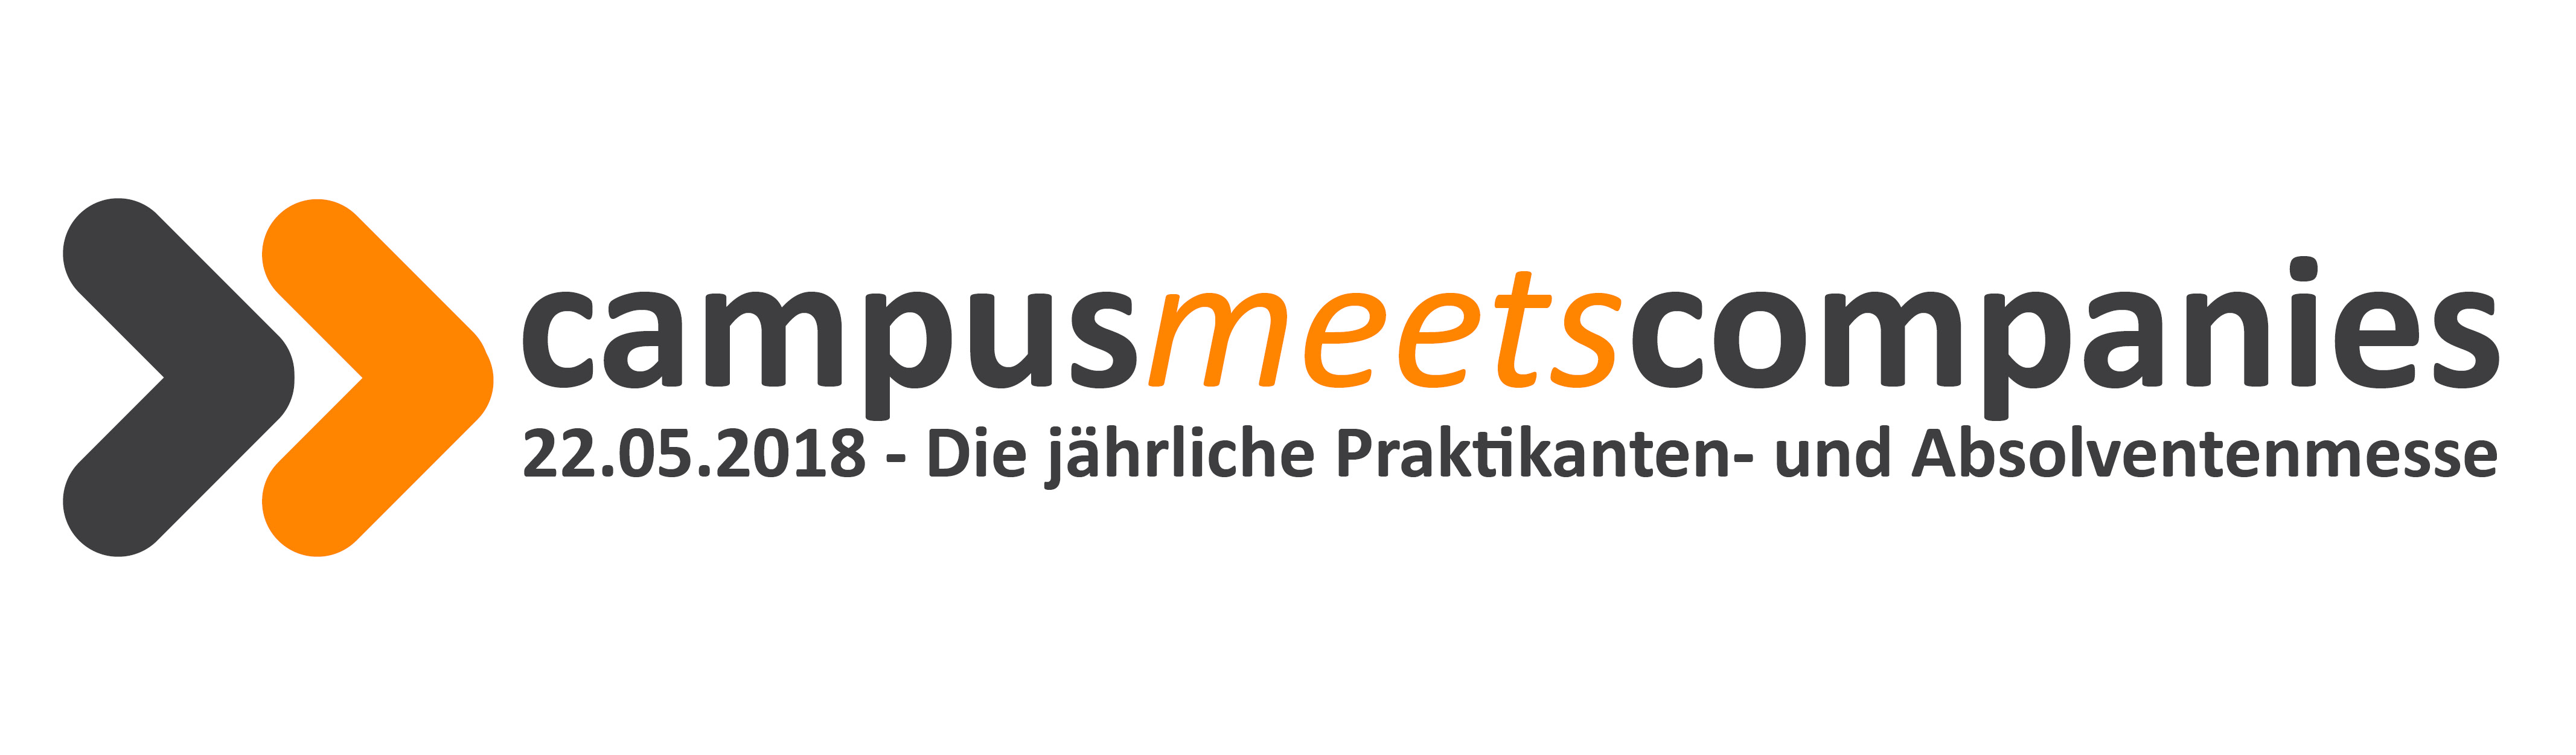 campusmeetscompanies